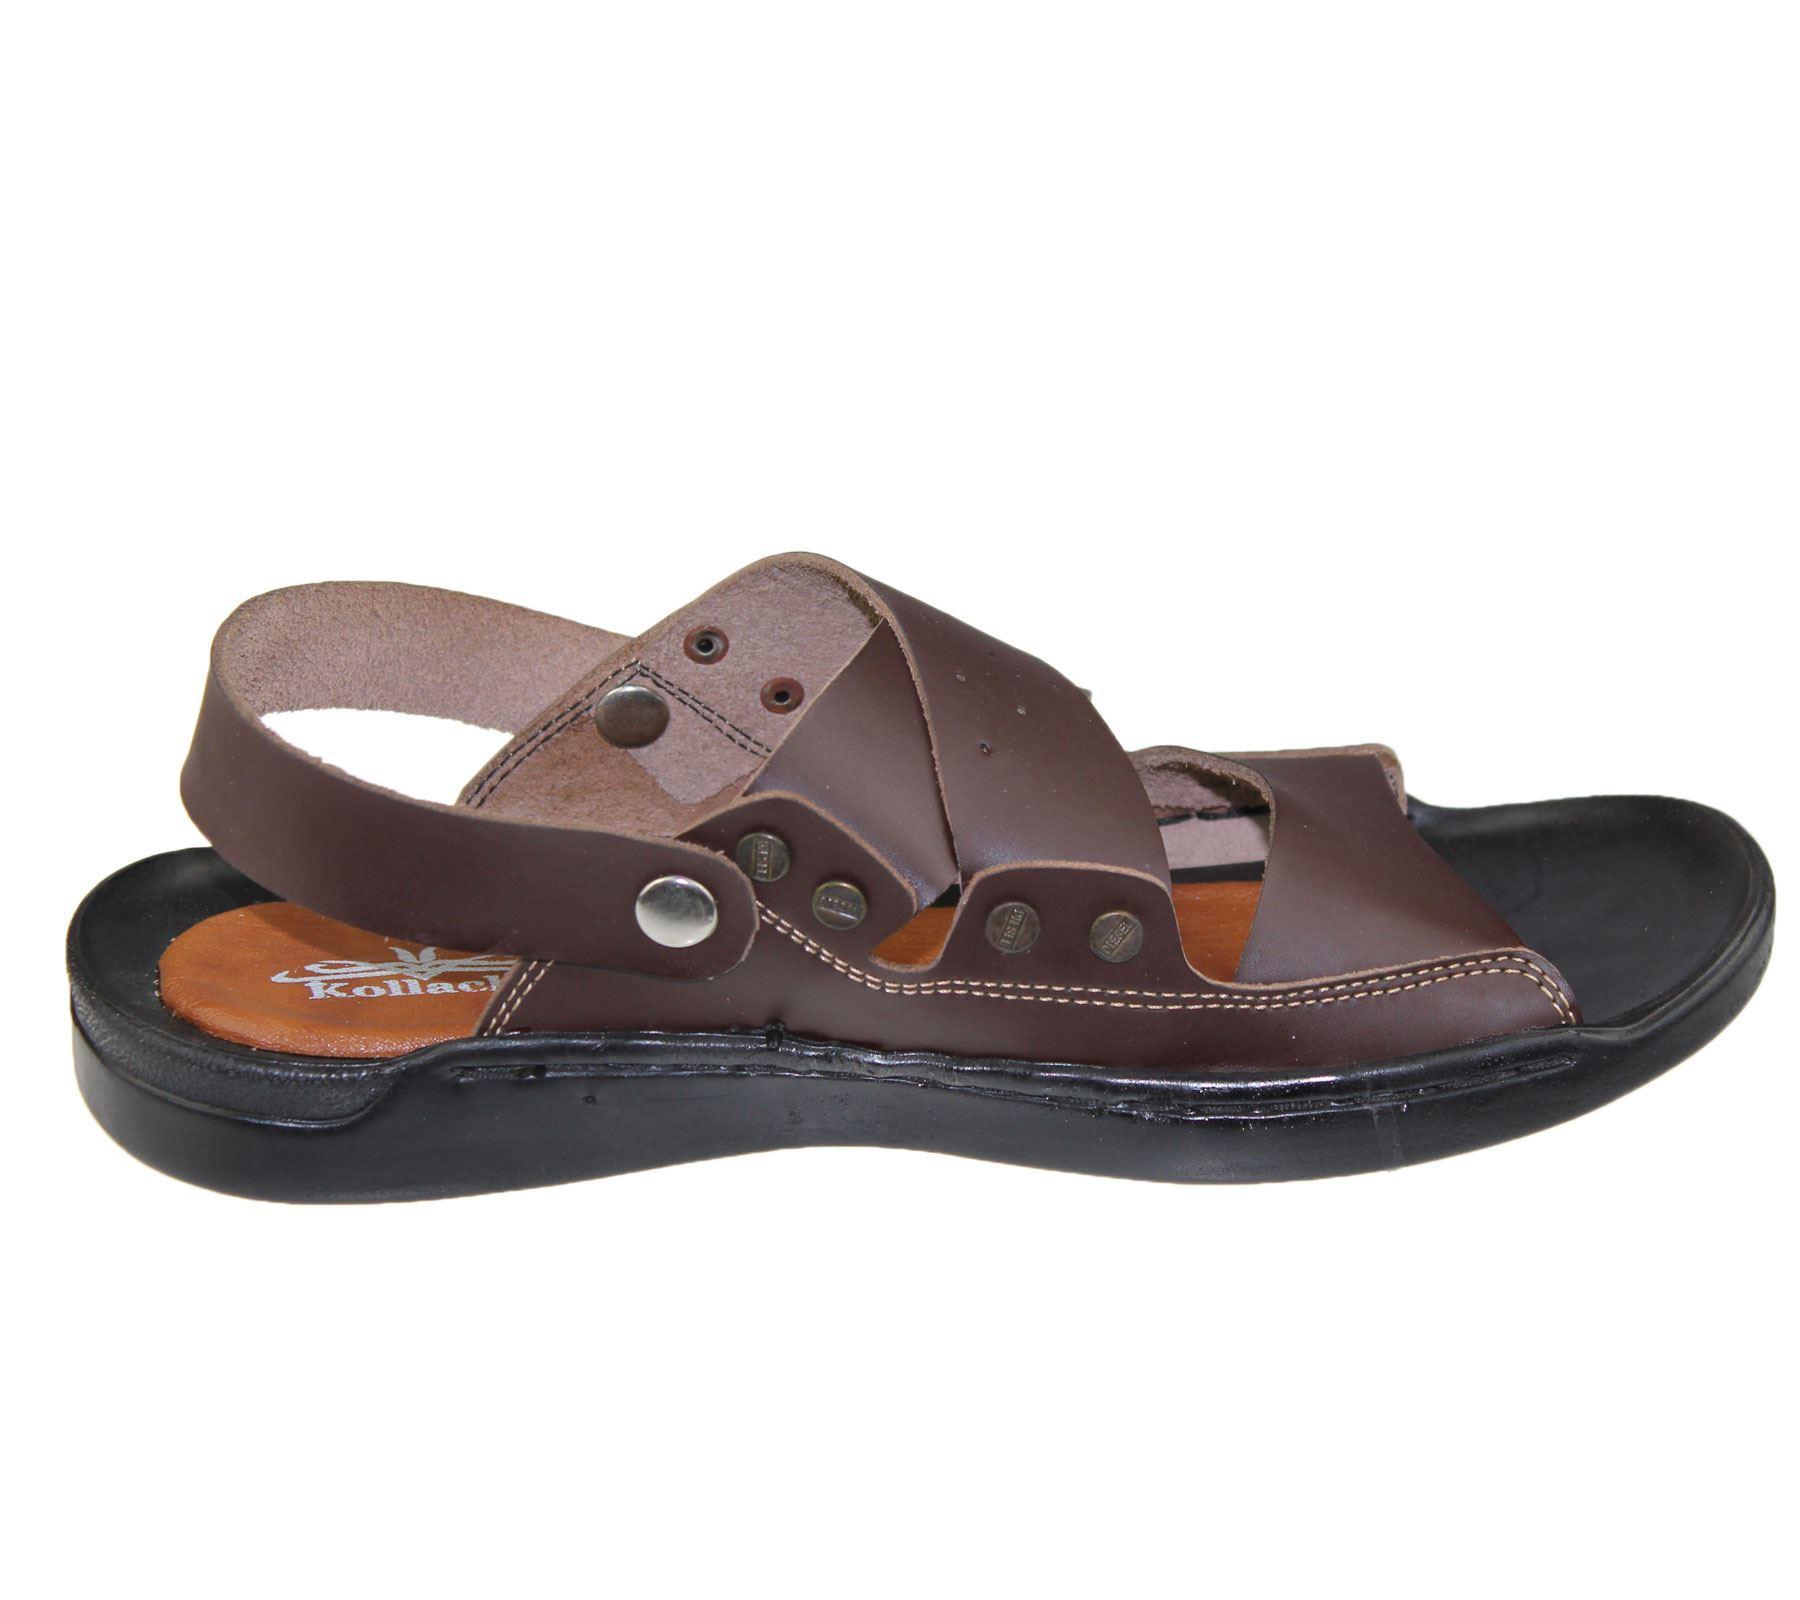 mens sandals casual beach walking beach summer slipper. Black Bedroom Furniture Sets. Home Design Ideas